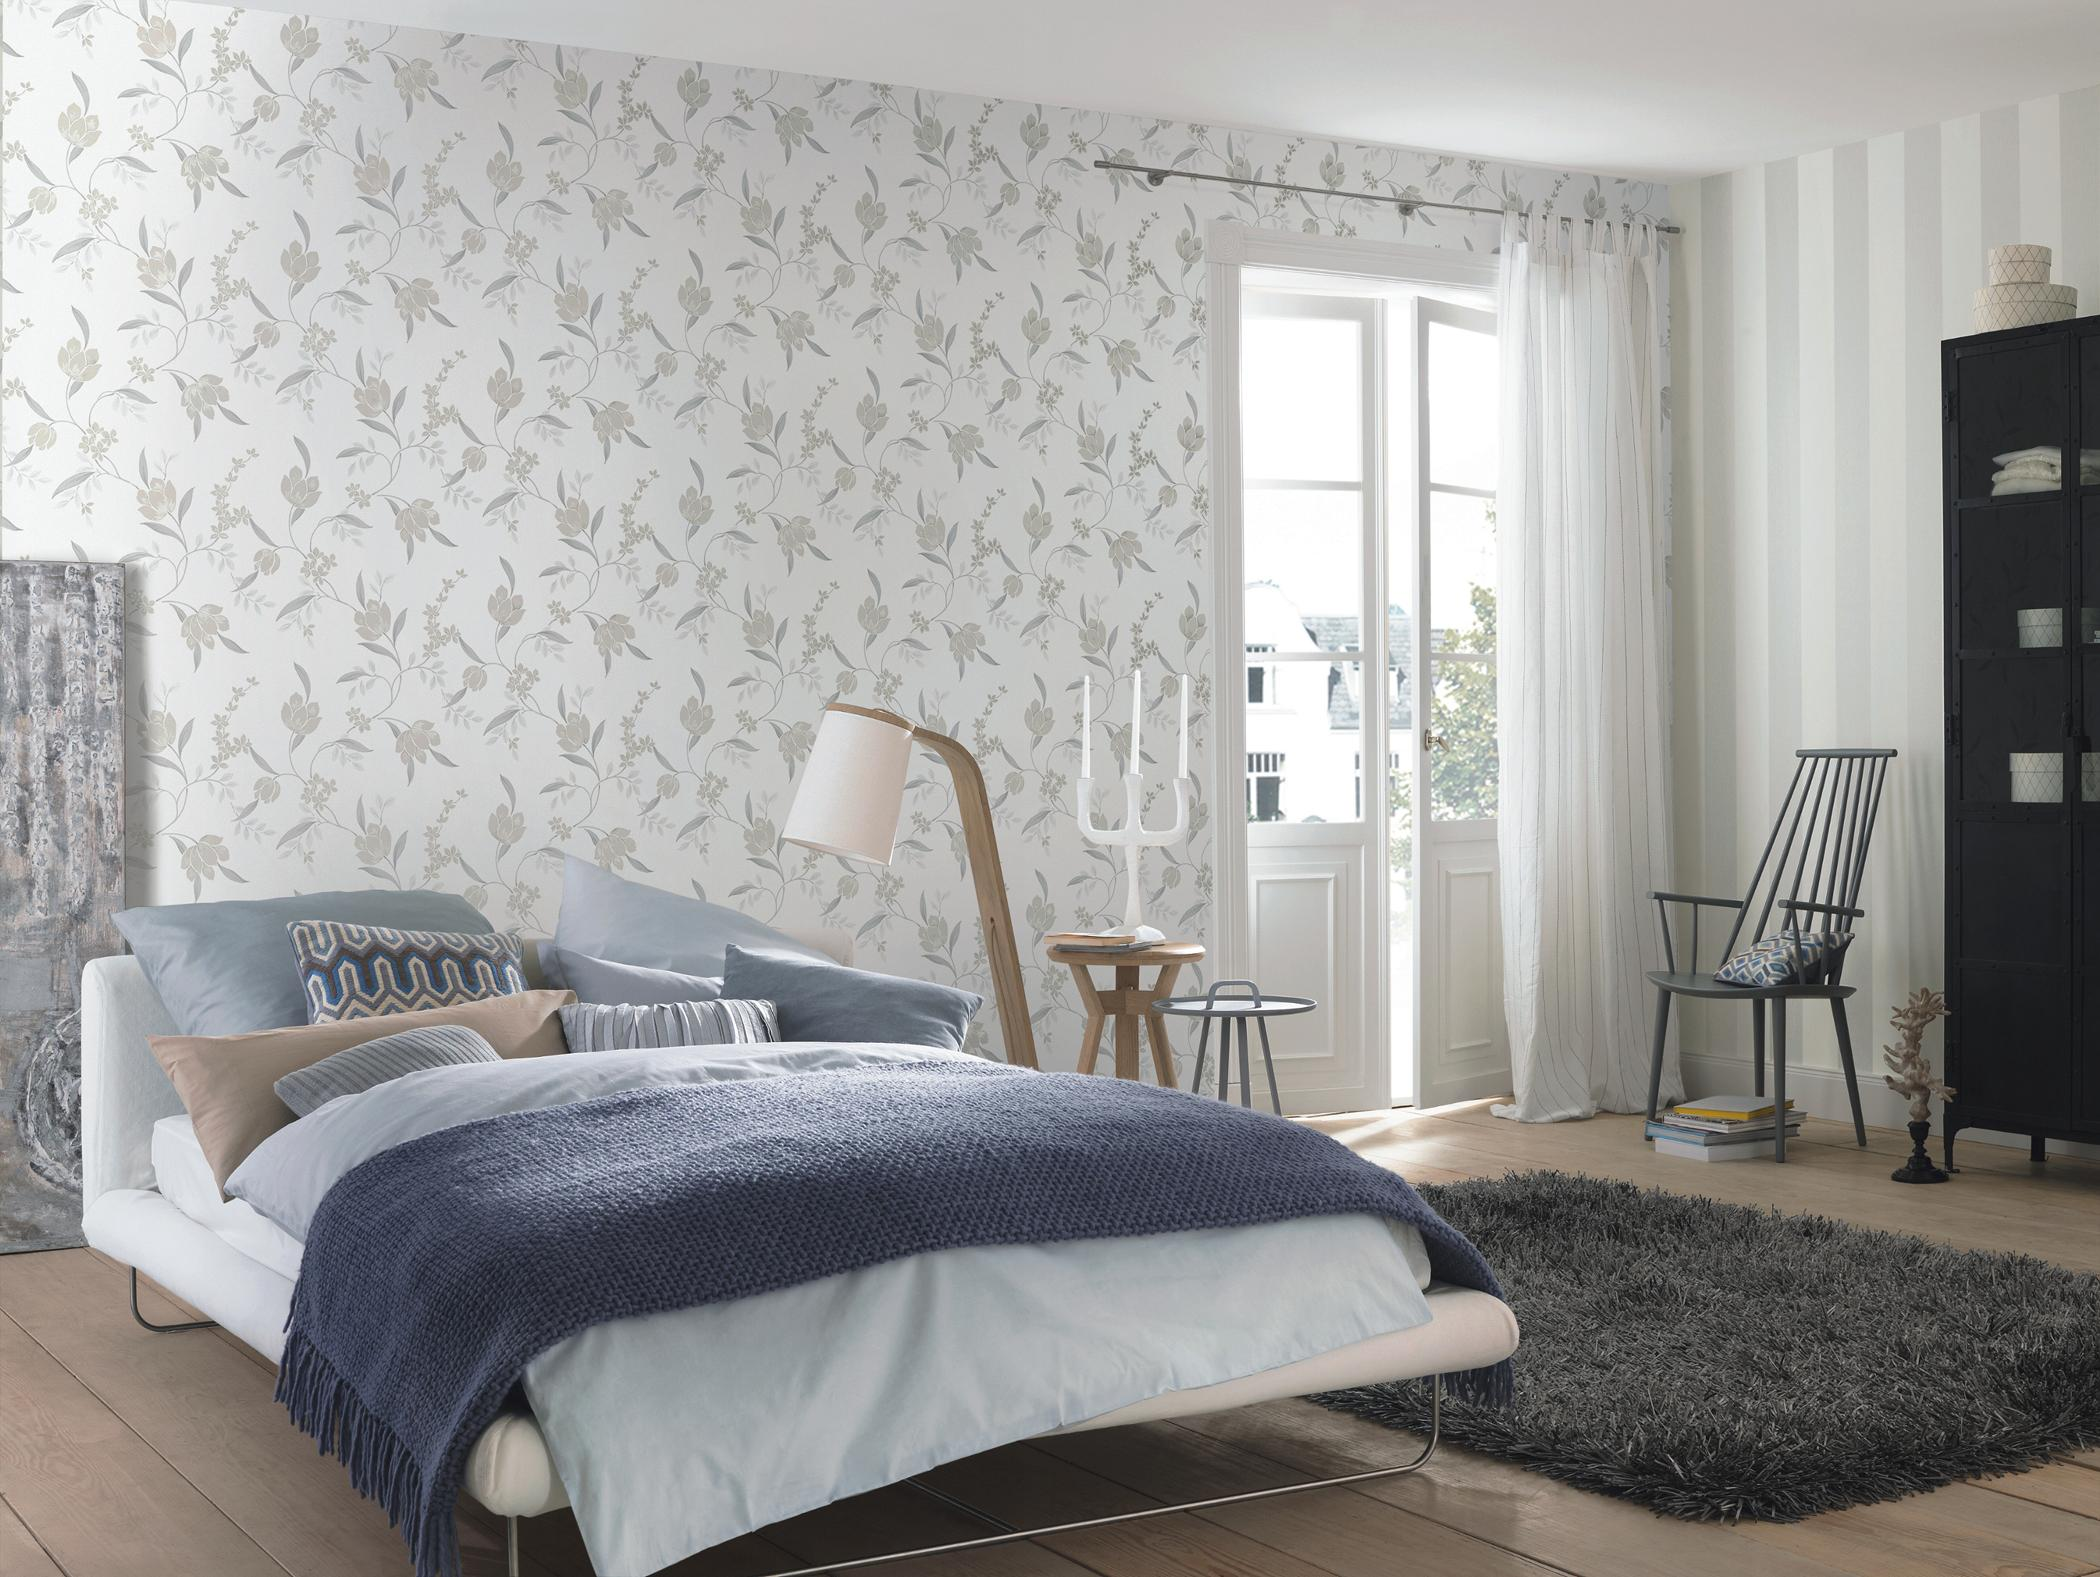 barockes bett bilder ideen couchstyle. Black Bedroom Furniture Sets. Home Design Ideas